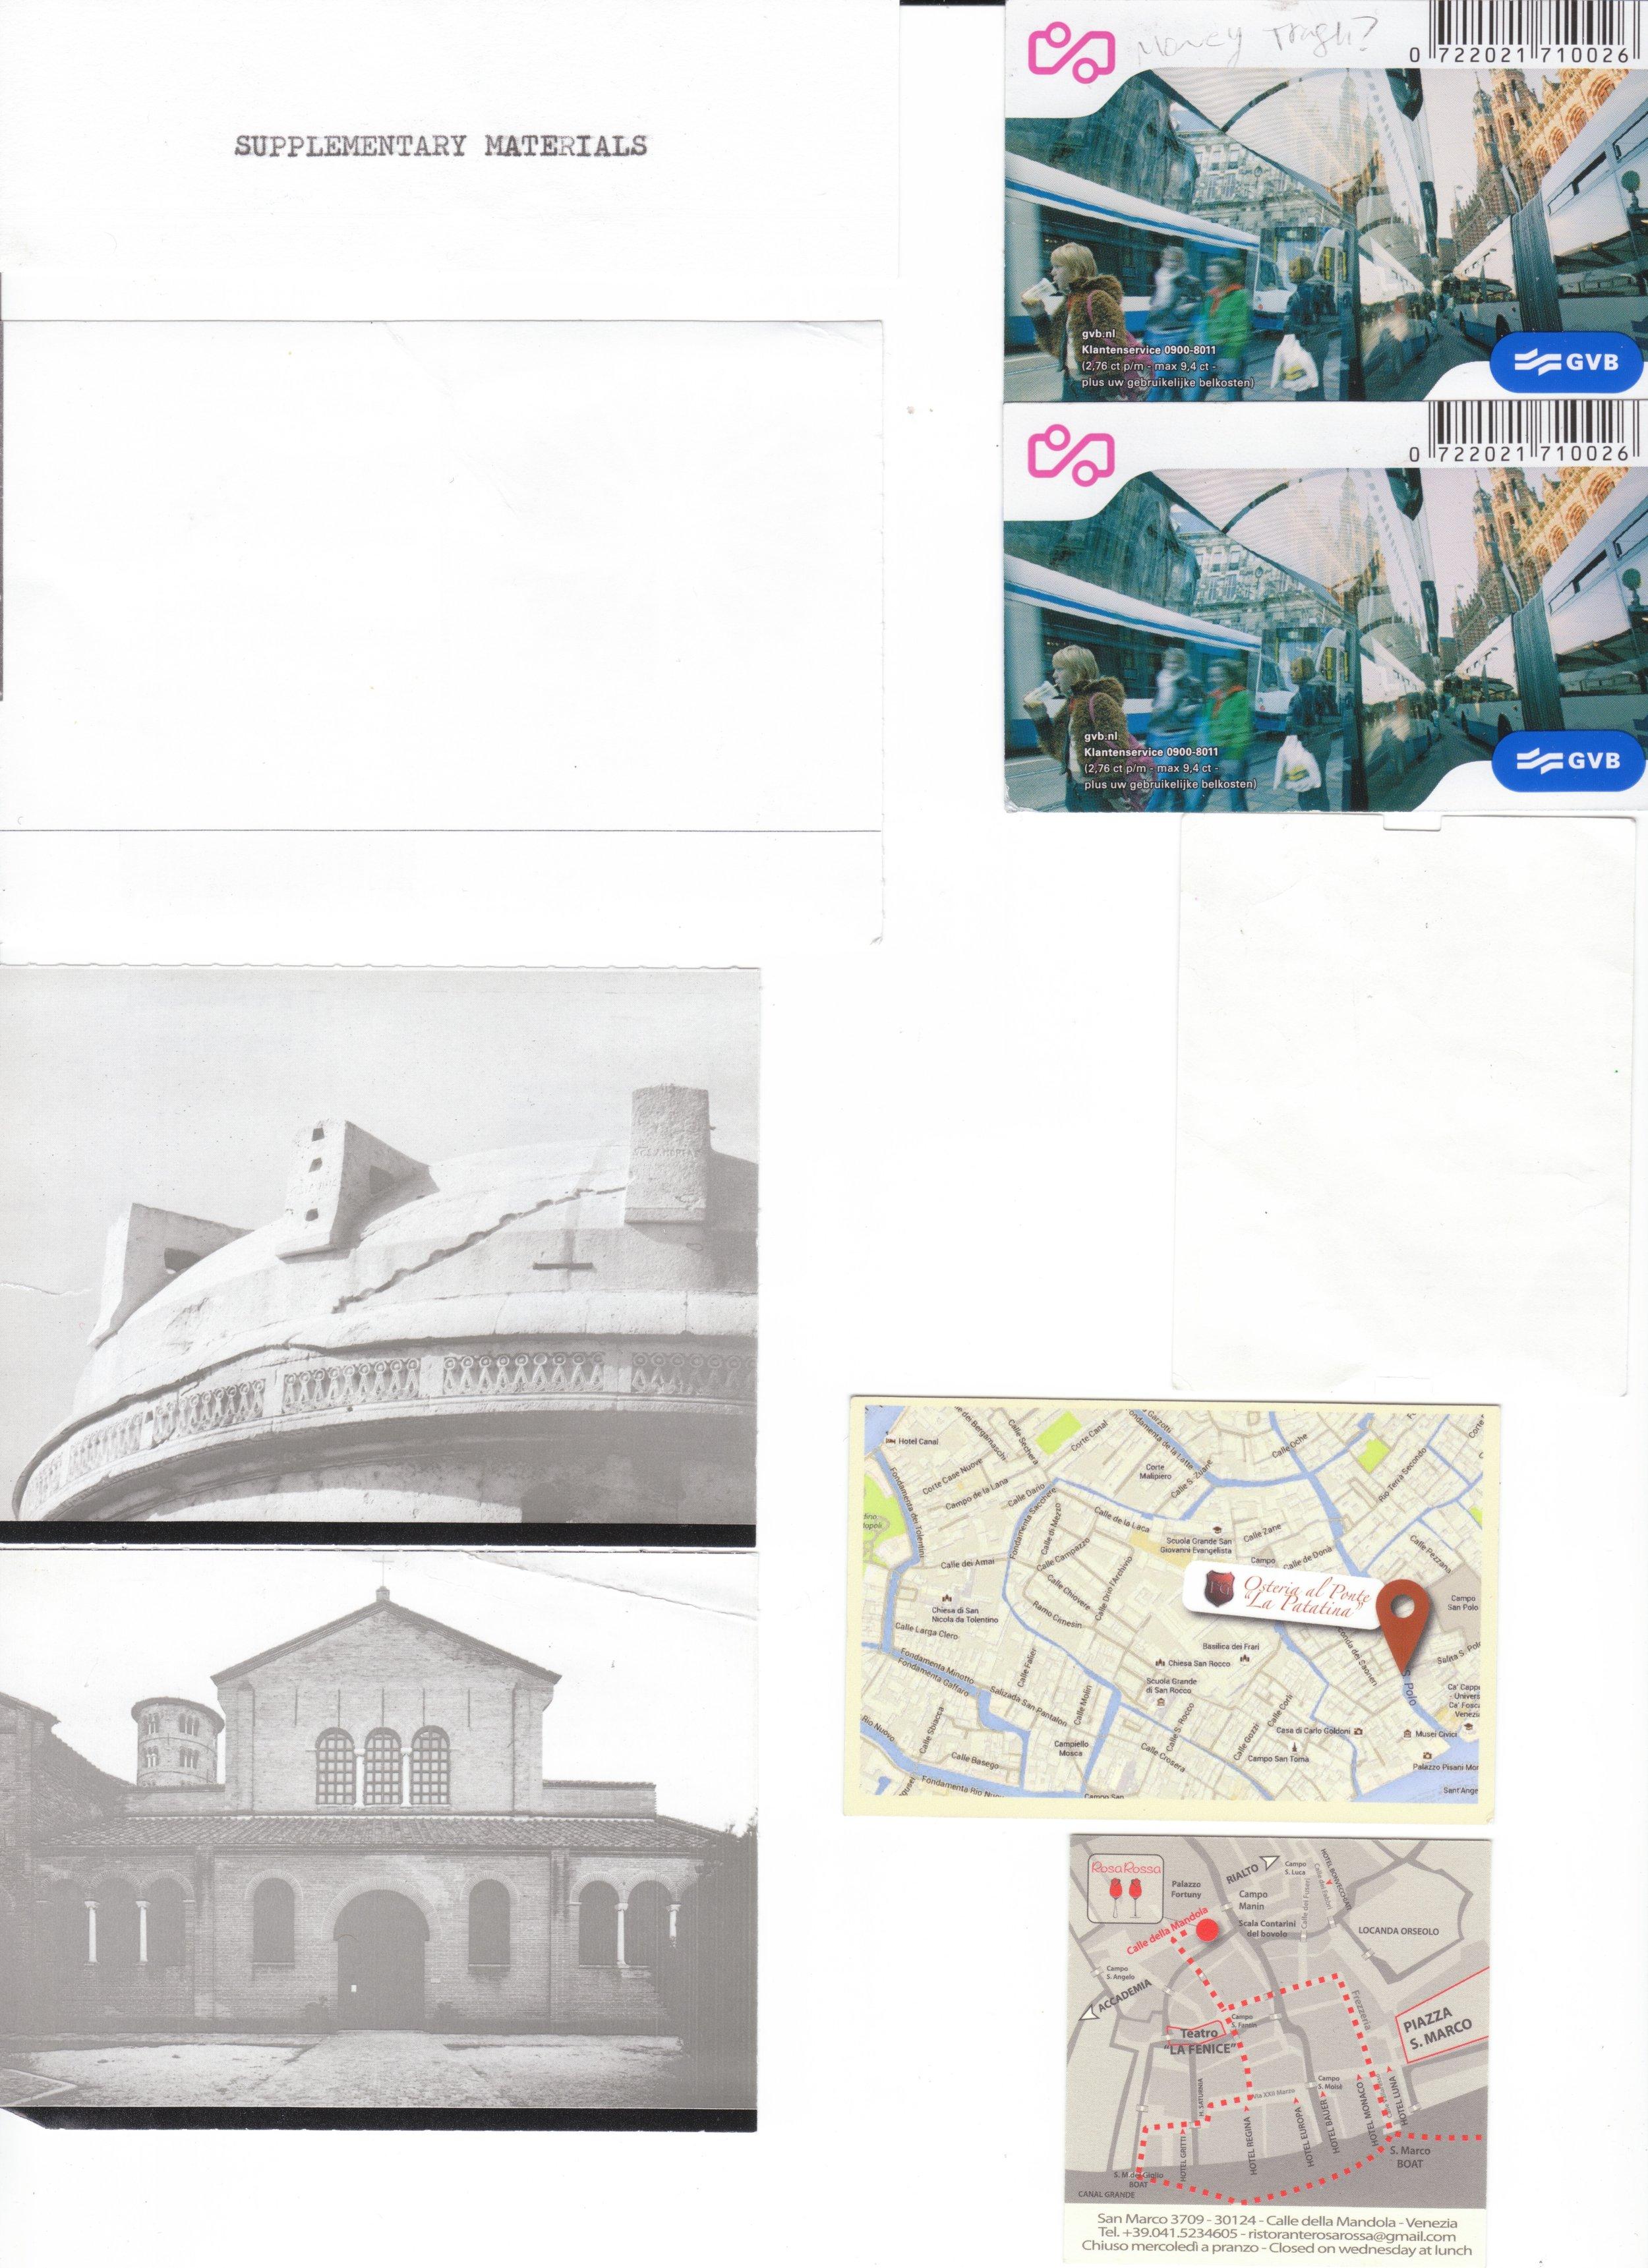 j14_Page_112.jpg